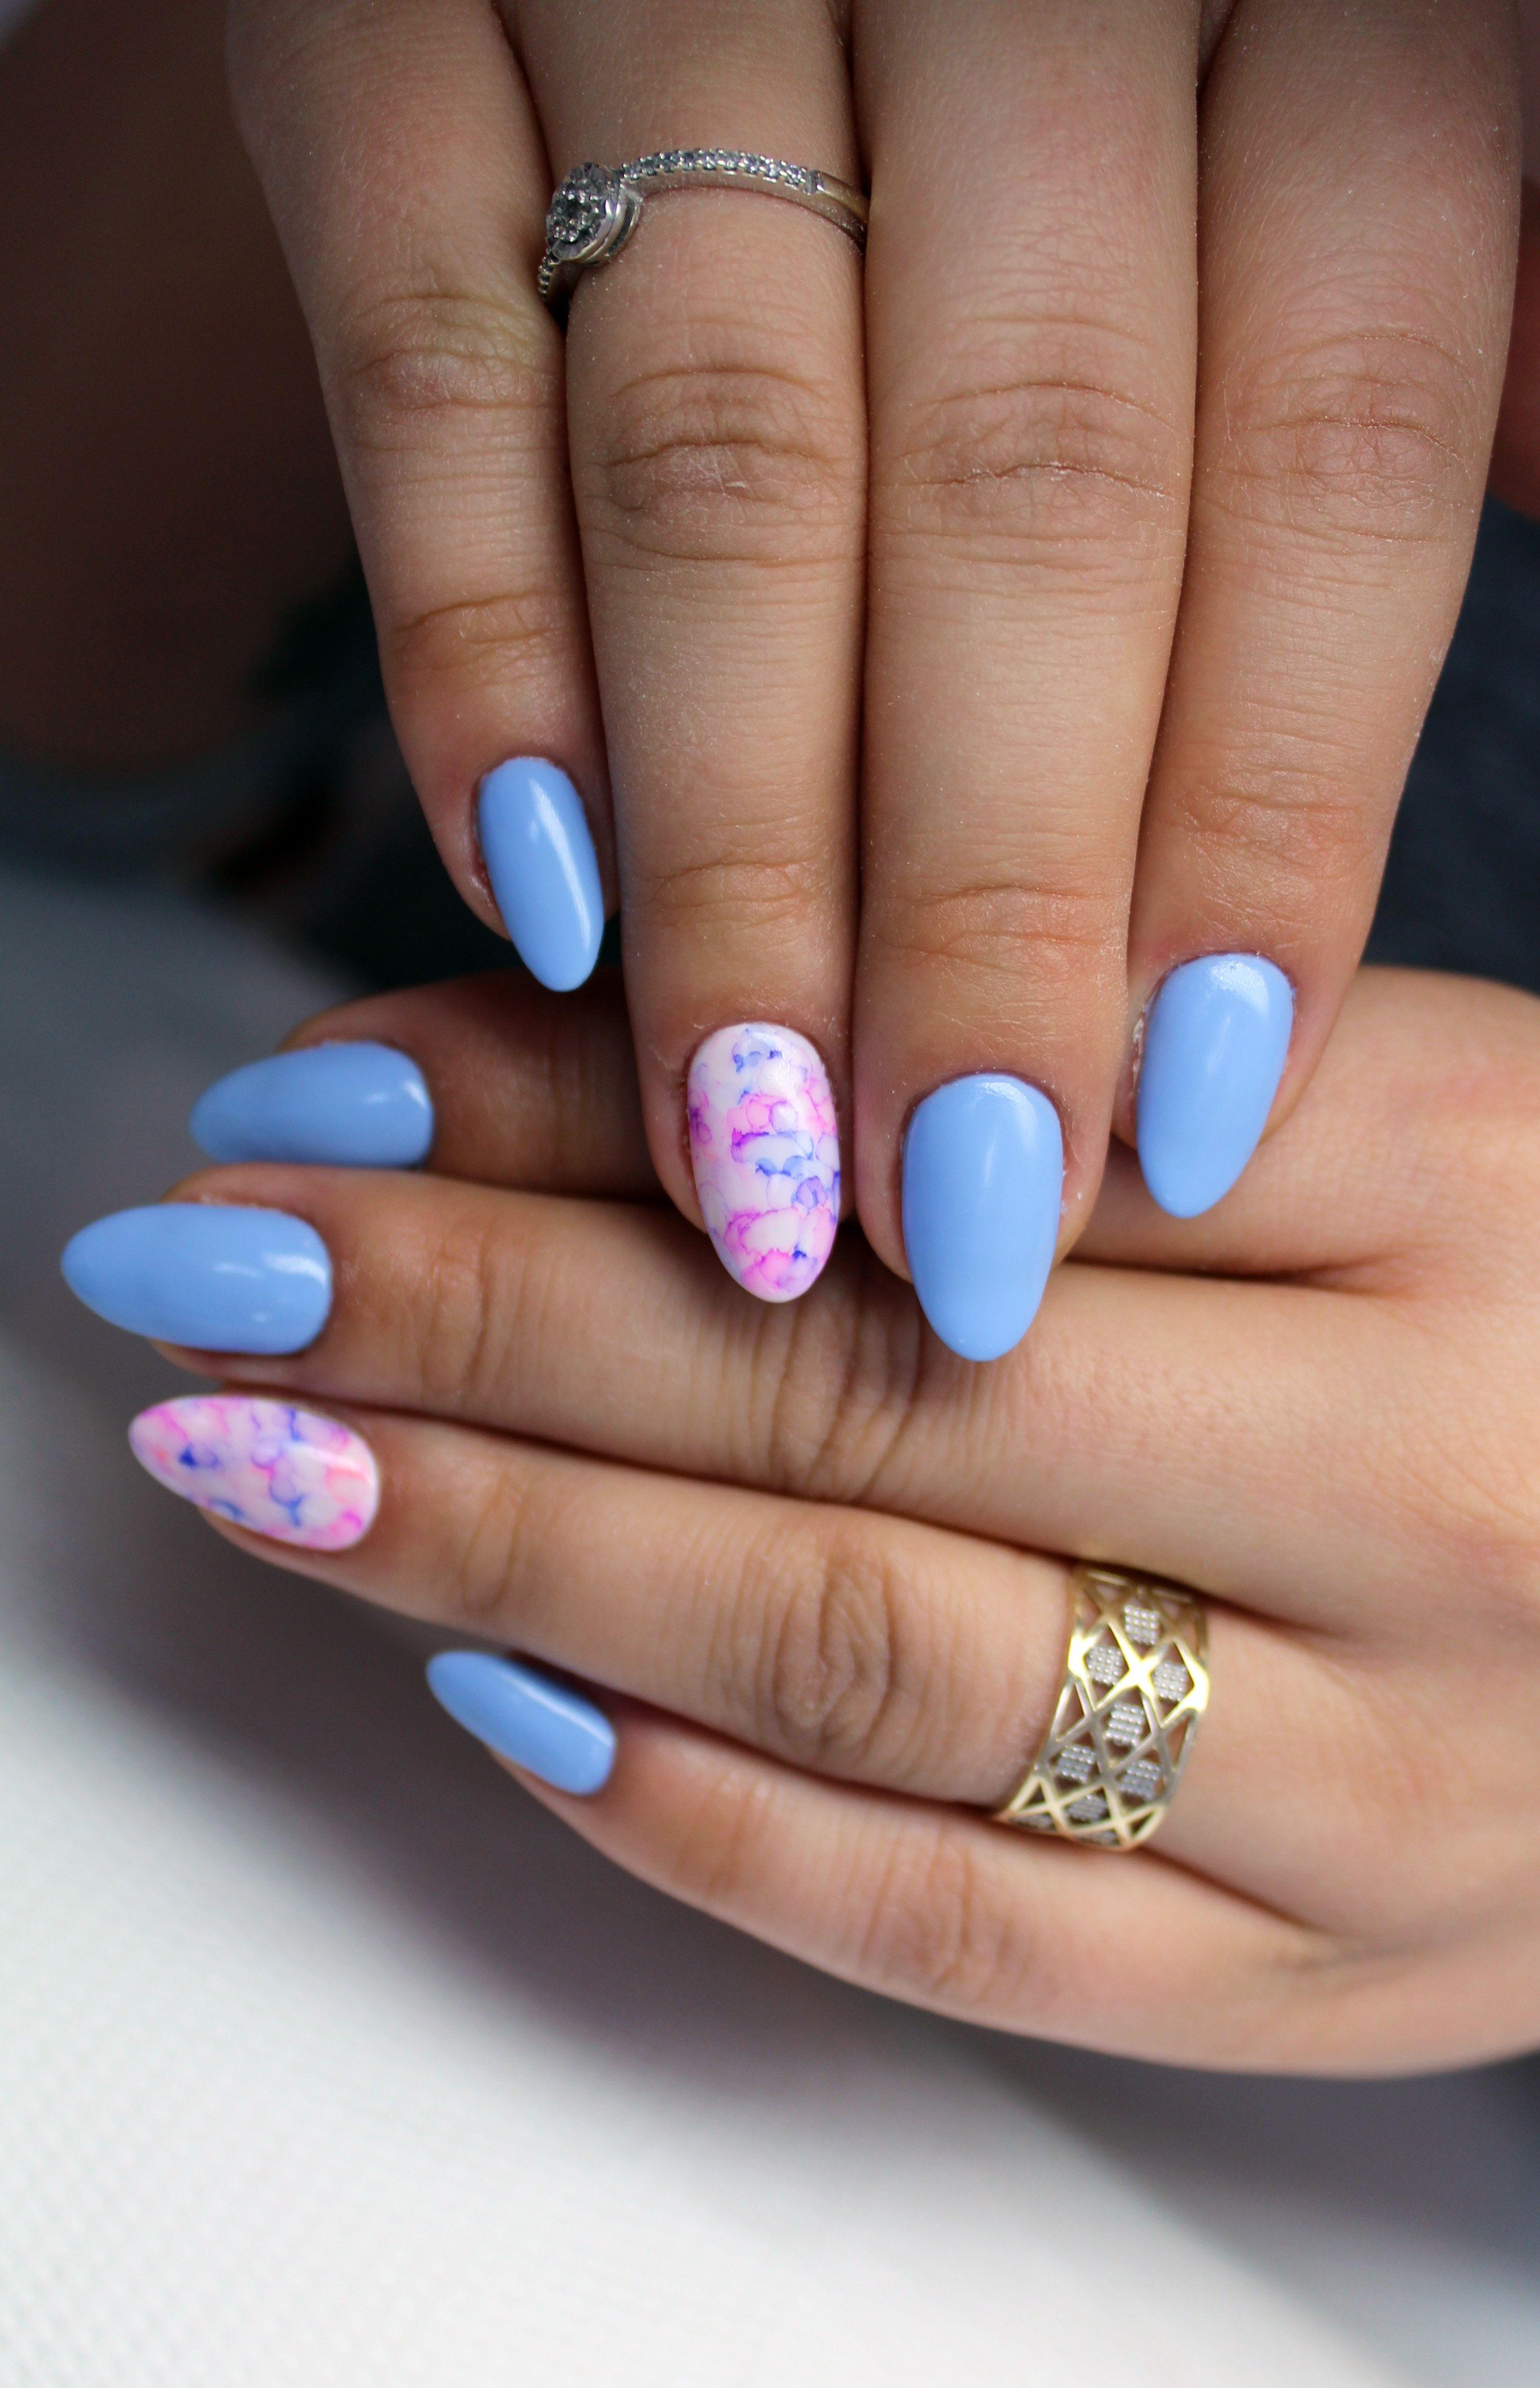 Www Naillook Pl Paznokcie Nail Nails Babyblue Spring Wiosna